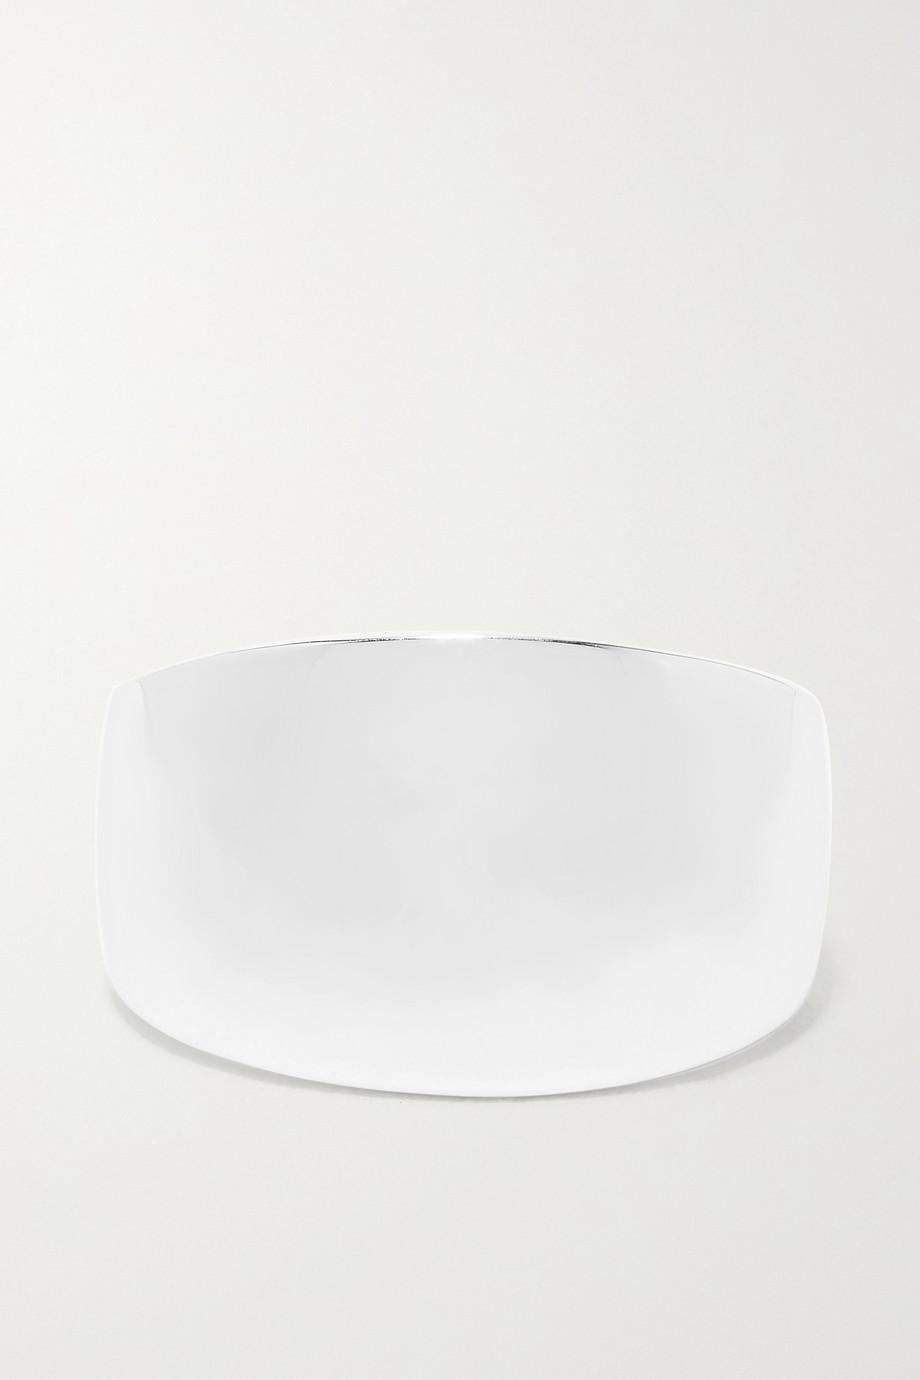 Anita Ko Bijou d'oreille en or blanc 18 carats Galaxy